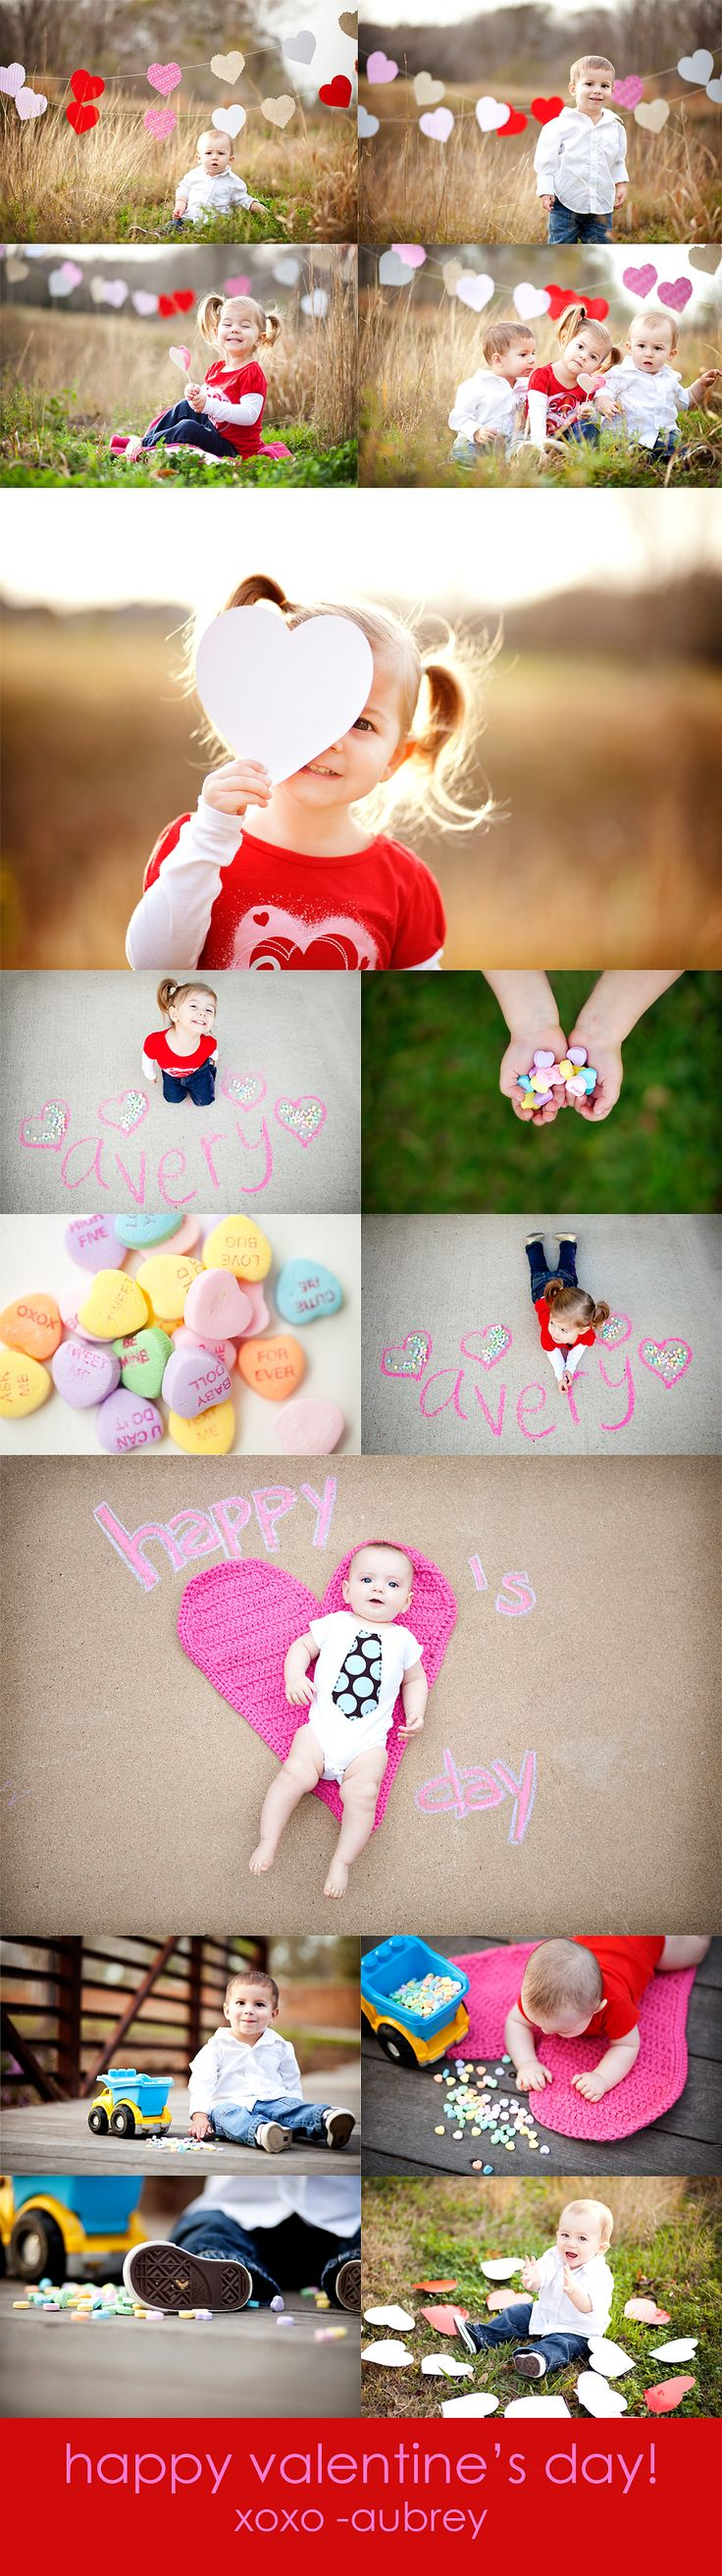 Very creative Valentine's Day images from Aubrey Torrey Photography | www.aubreytorreyphotography.com